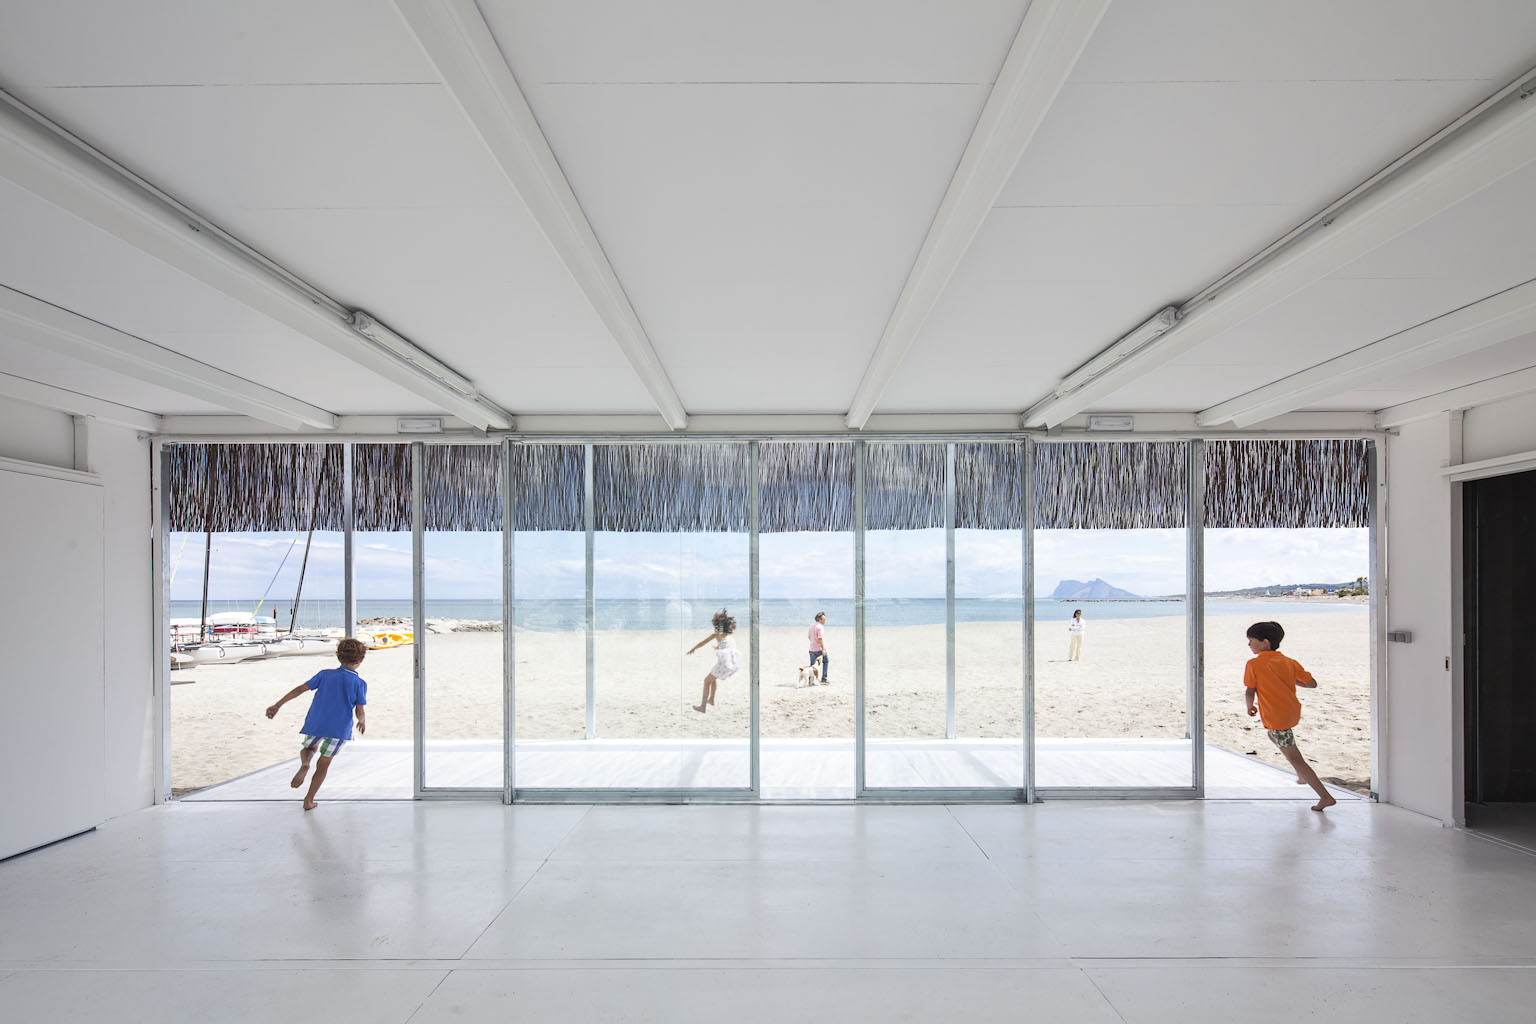 Fotografía de Arquitectura: Montse Zamorano, Escuela de Vela de Sotogrande en Cádiz. Héctor Fernández Elorza/HFE Arch + Carlos García Fernández . Image © Montse Zamorano